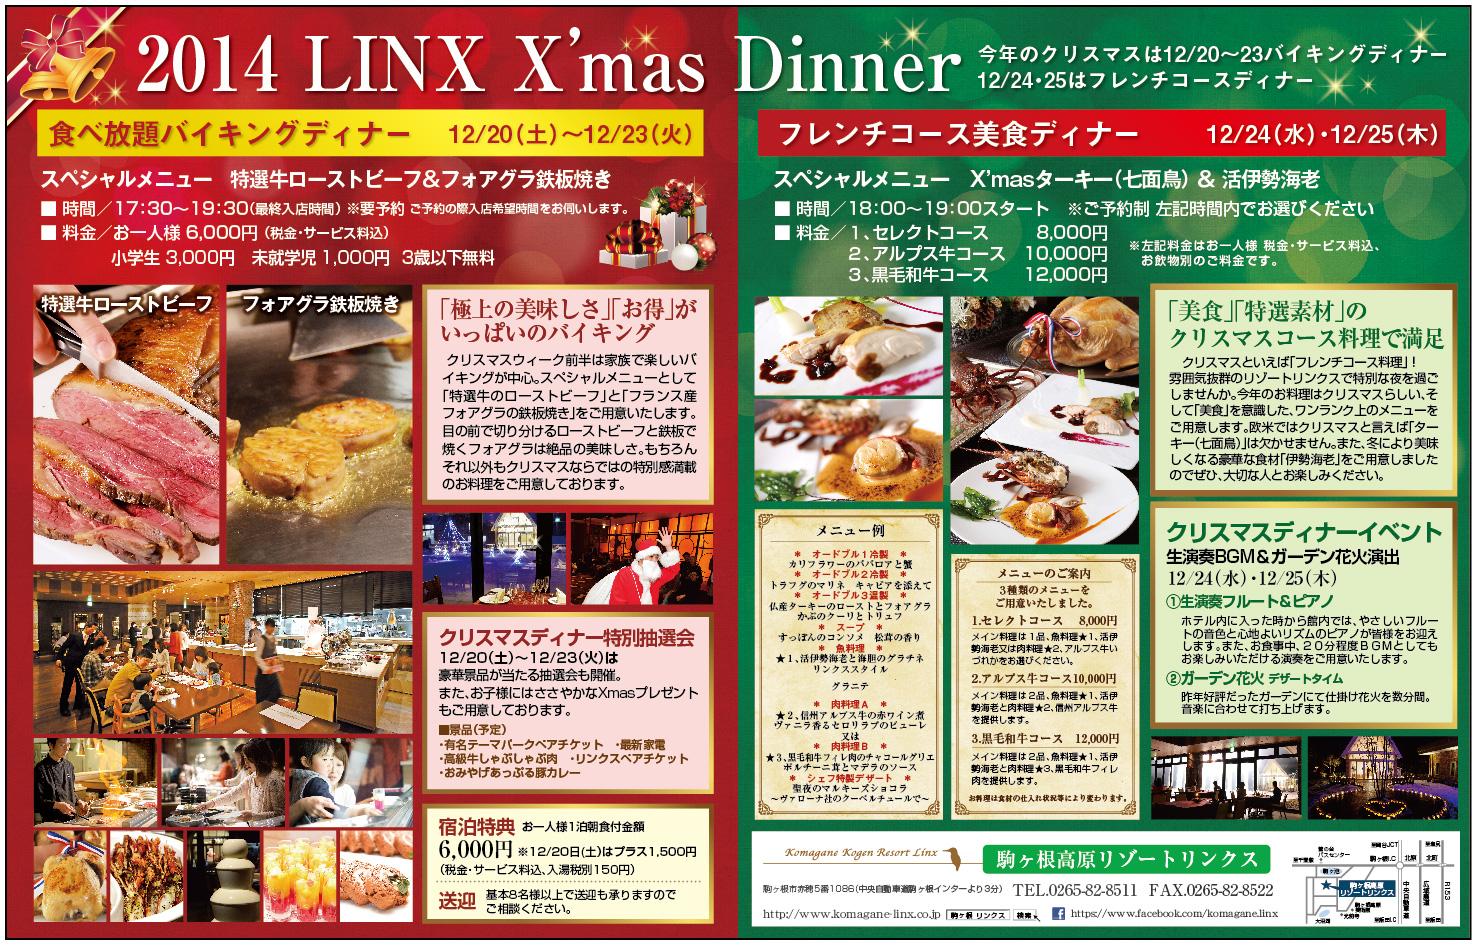 http://www.komagane-linx.co.jp/blogimages/hotel_20141031_kamiina2.jpg